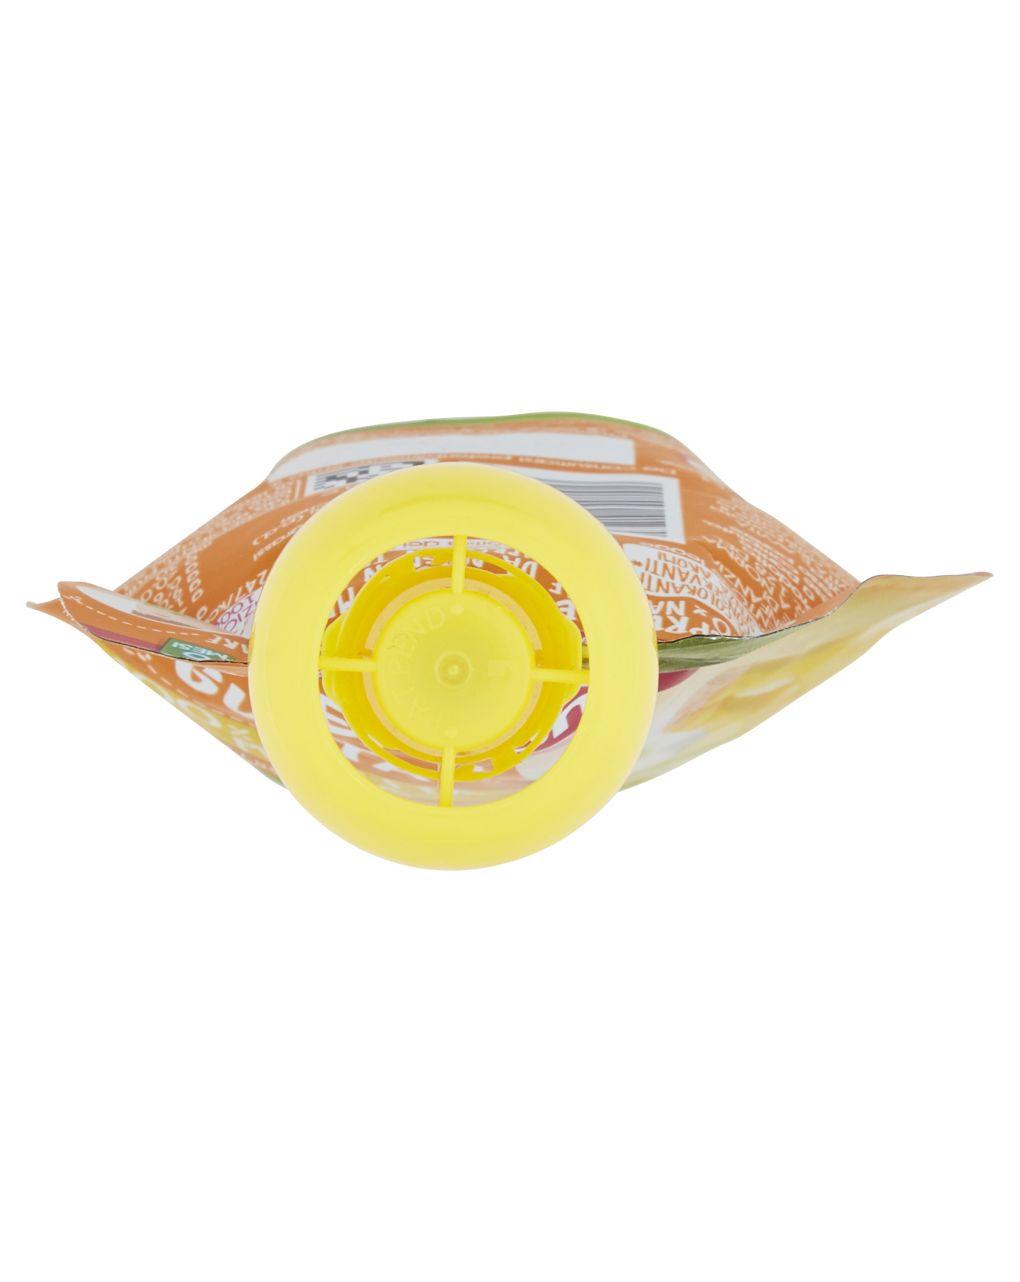 Plasmon - spremi e gusta frutta mista 100g - Plasmon